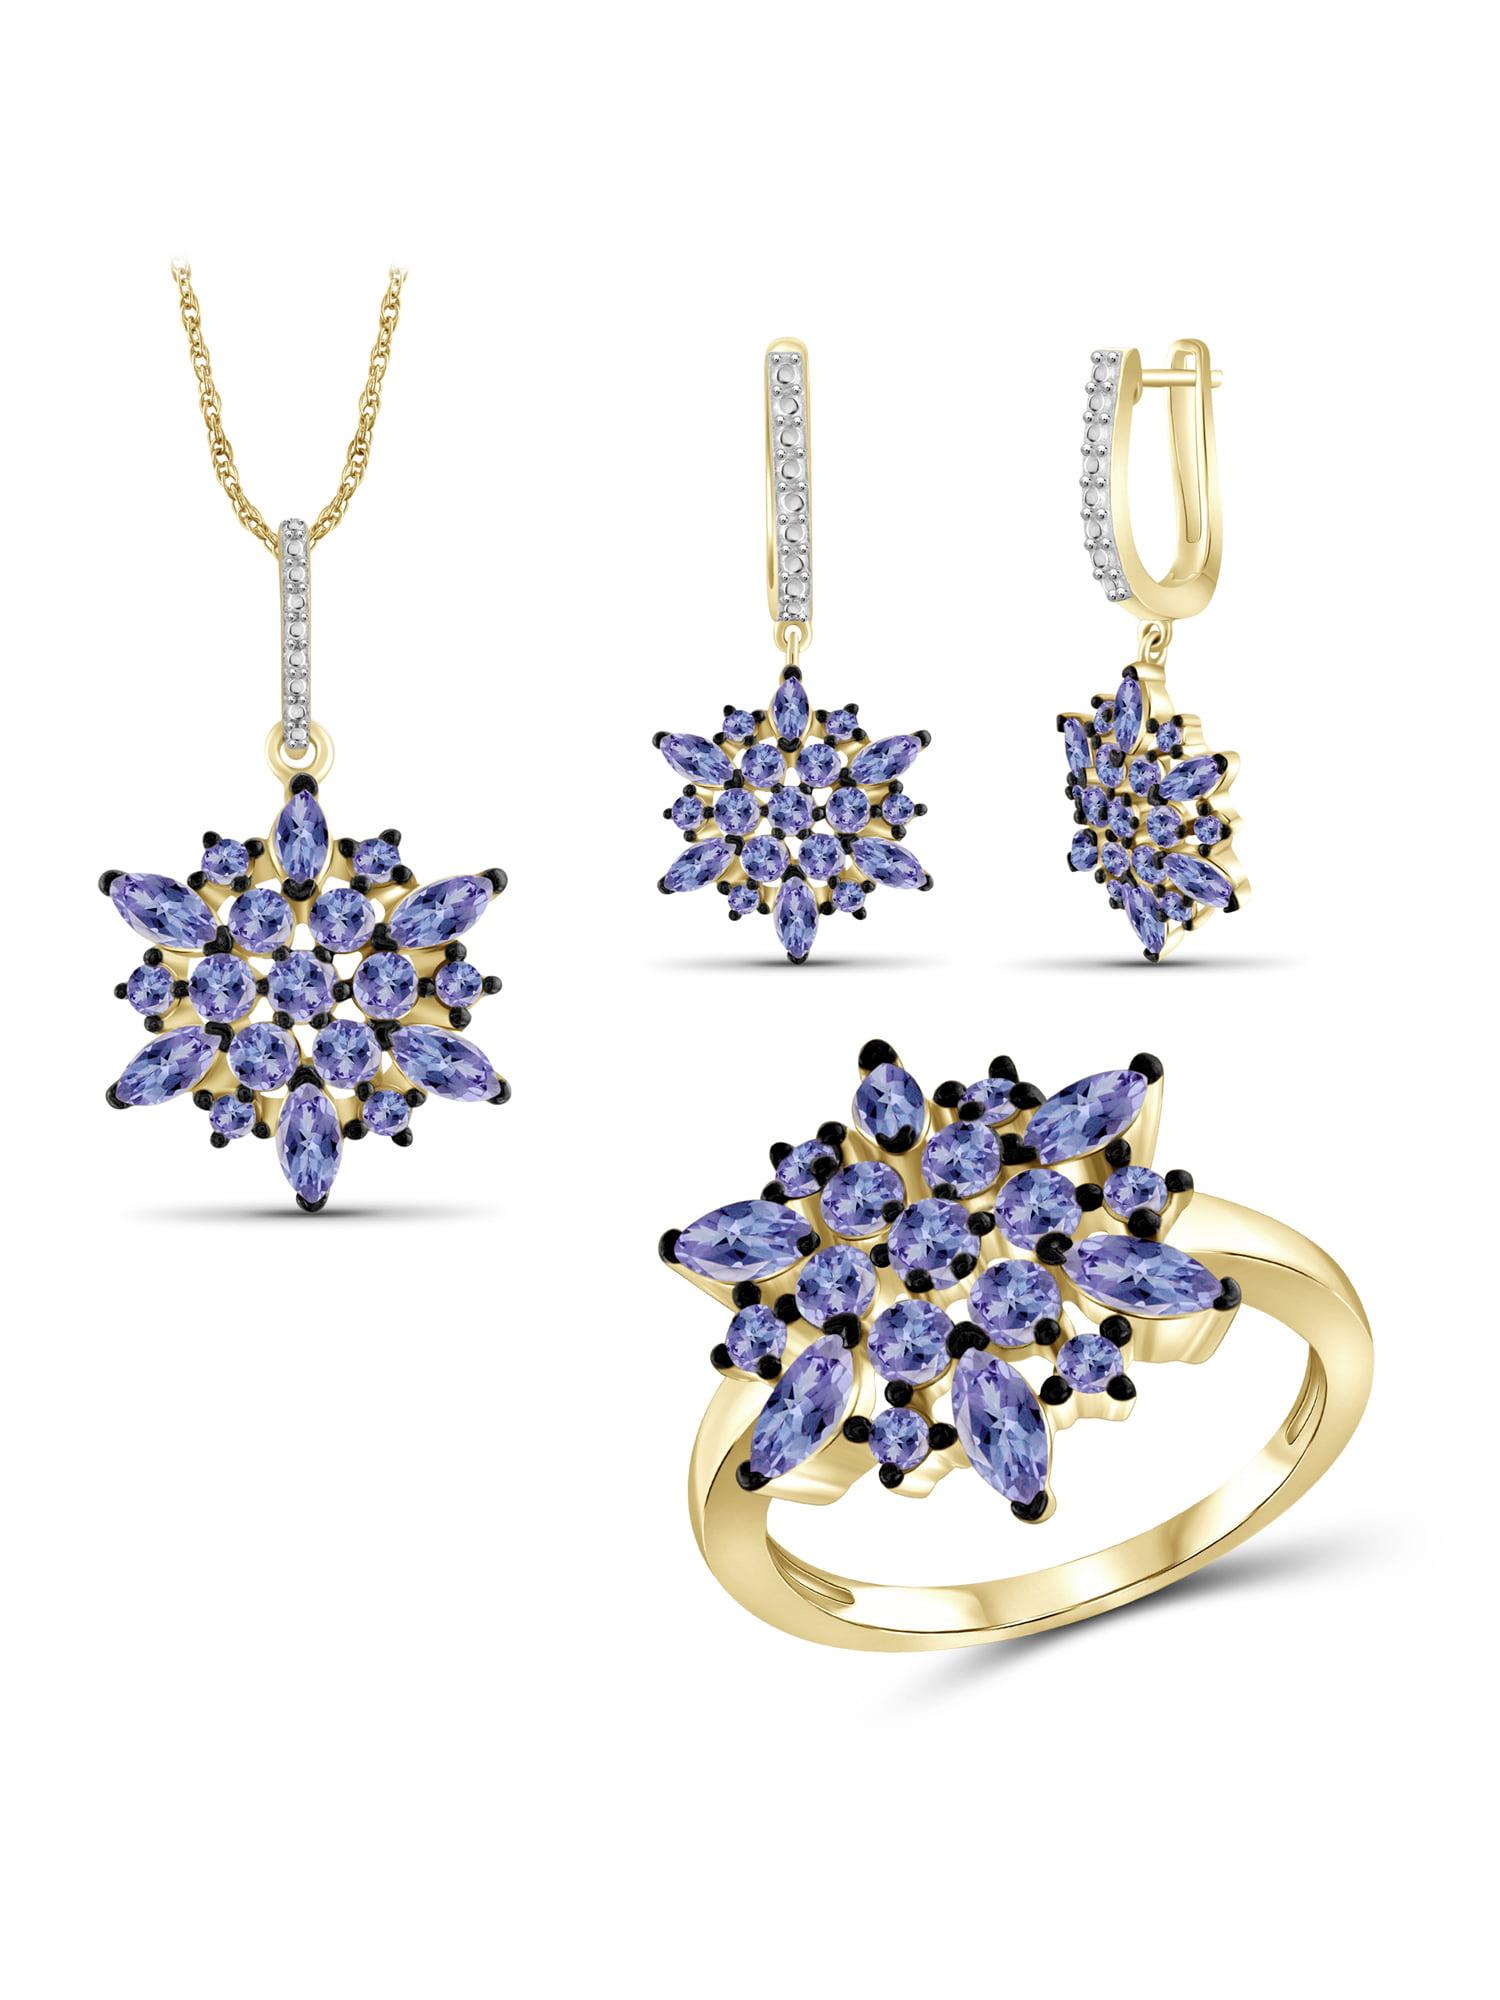 JewelersClub 6 1 4 Carat T.G.W. Tanzanite 14k Gold Over Silver 3-Piece Jewelry set by JewelersClub